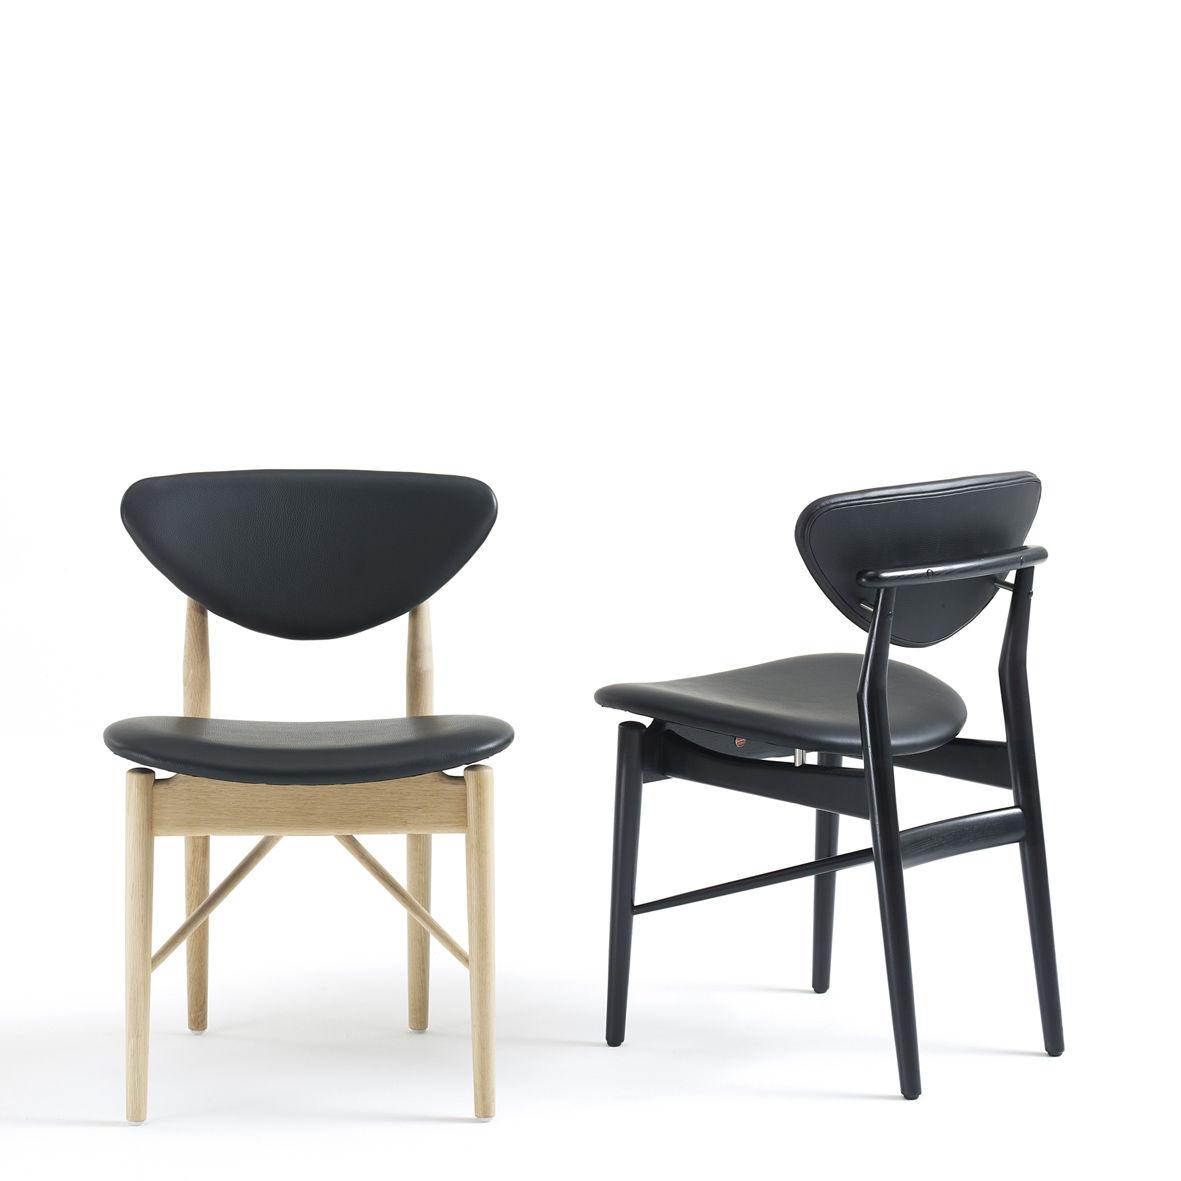 Scandinavian design chair   fabric   oak   leather 108 ONE COLLECTION   Scandinavian design chair   fabric   oak   leather   108   ONE  . Finn Juhl Chair 108. Home Design Ideas